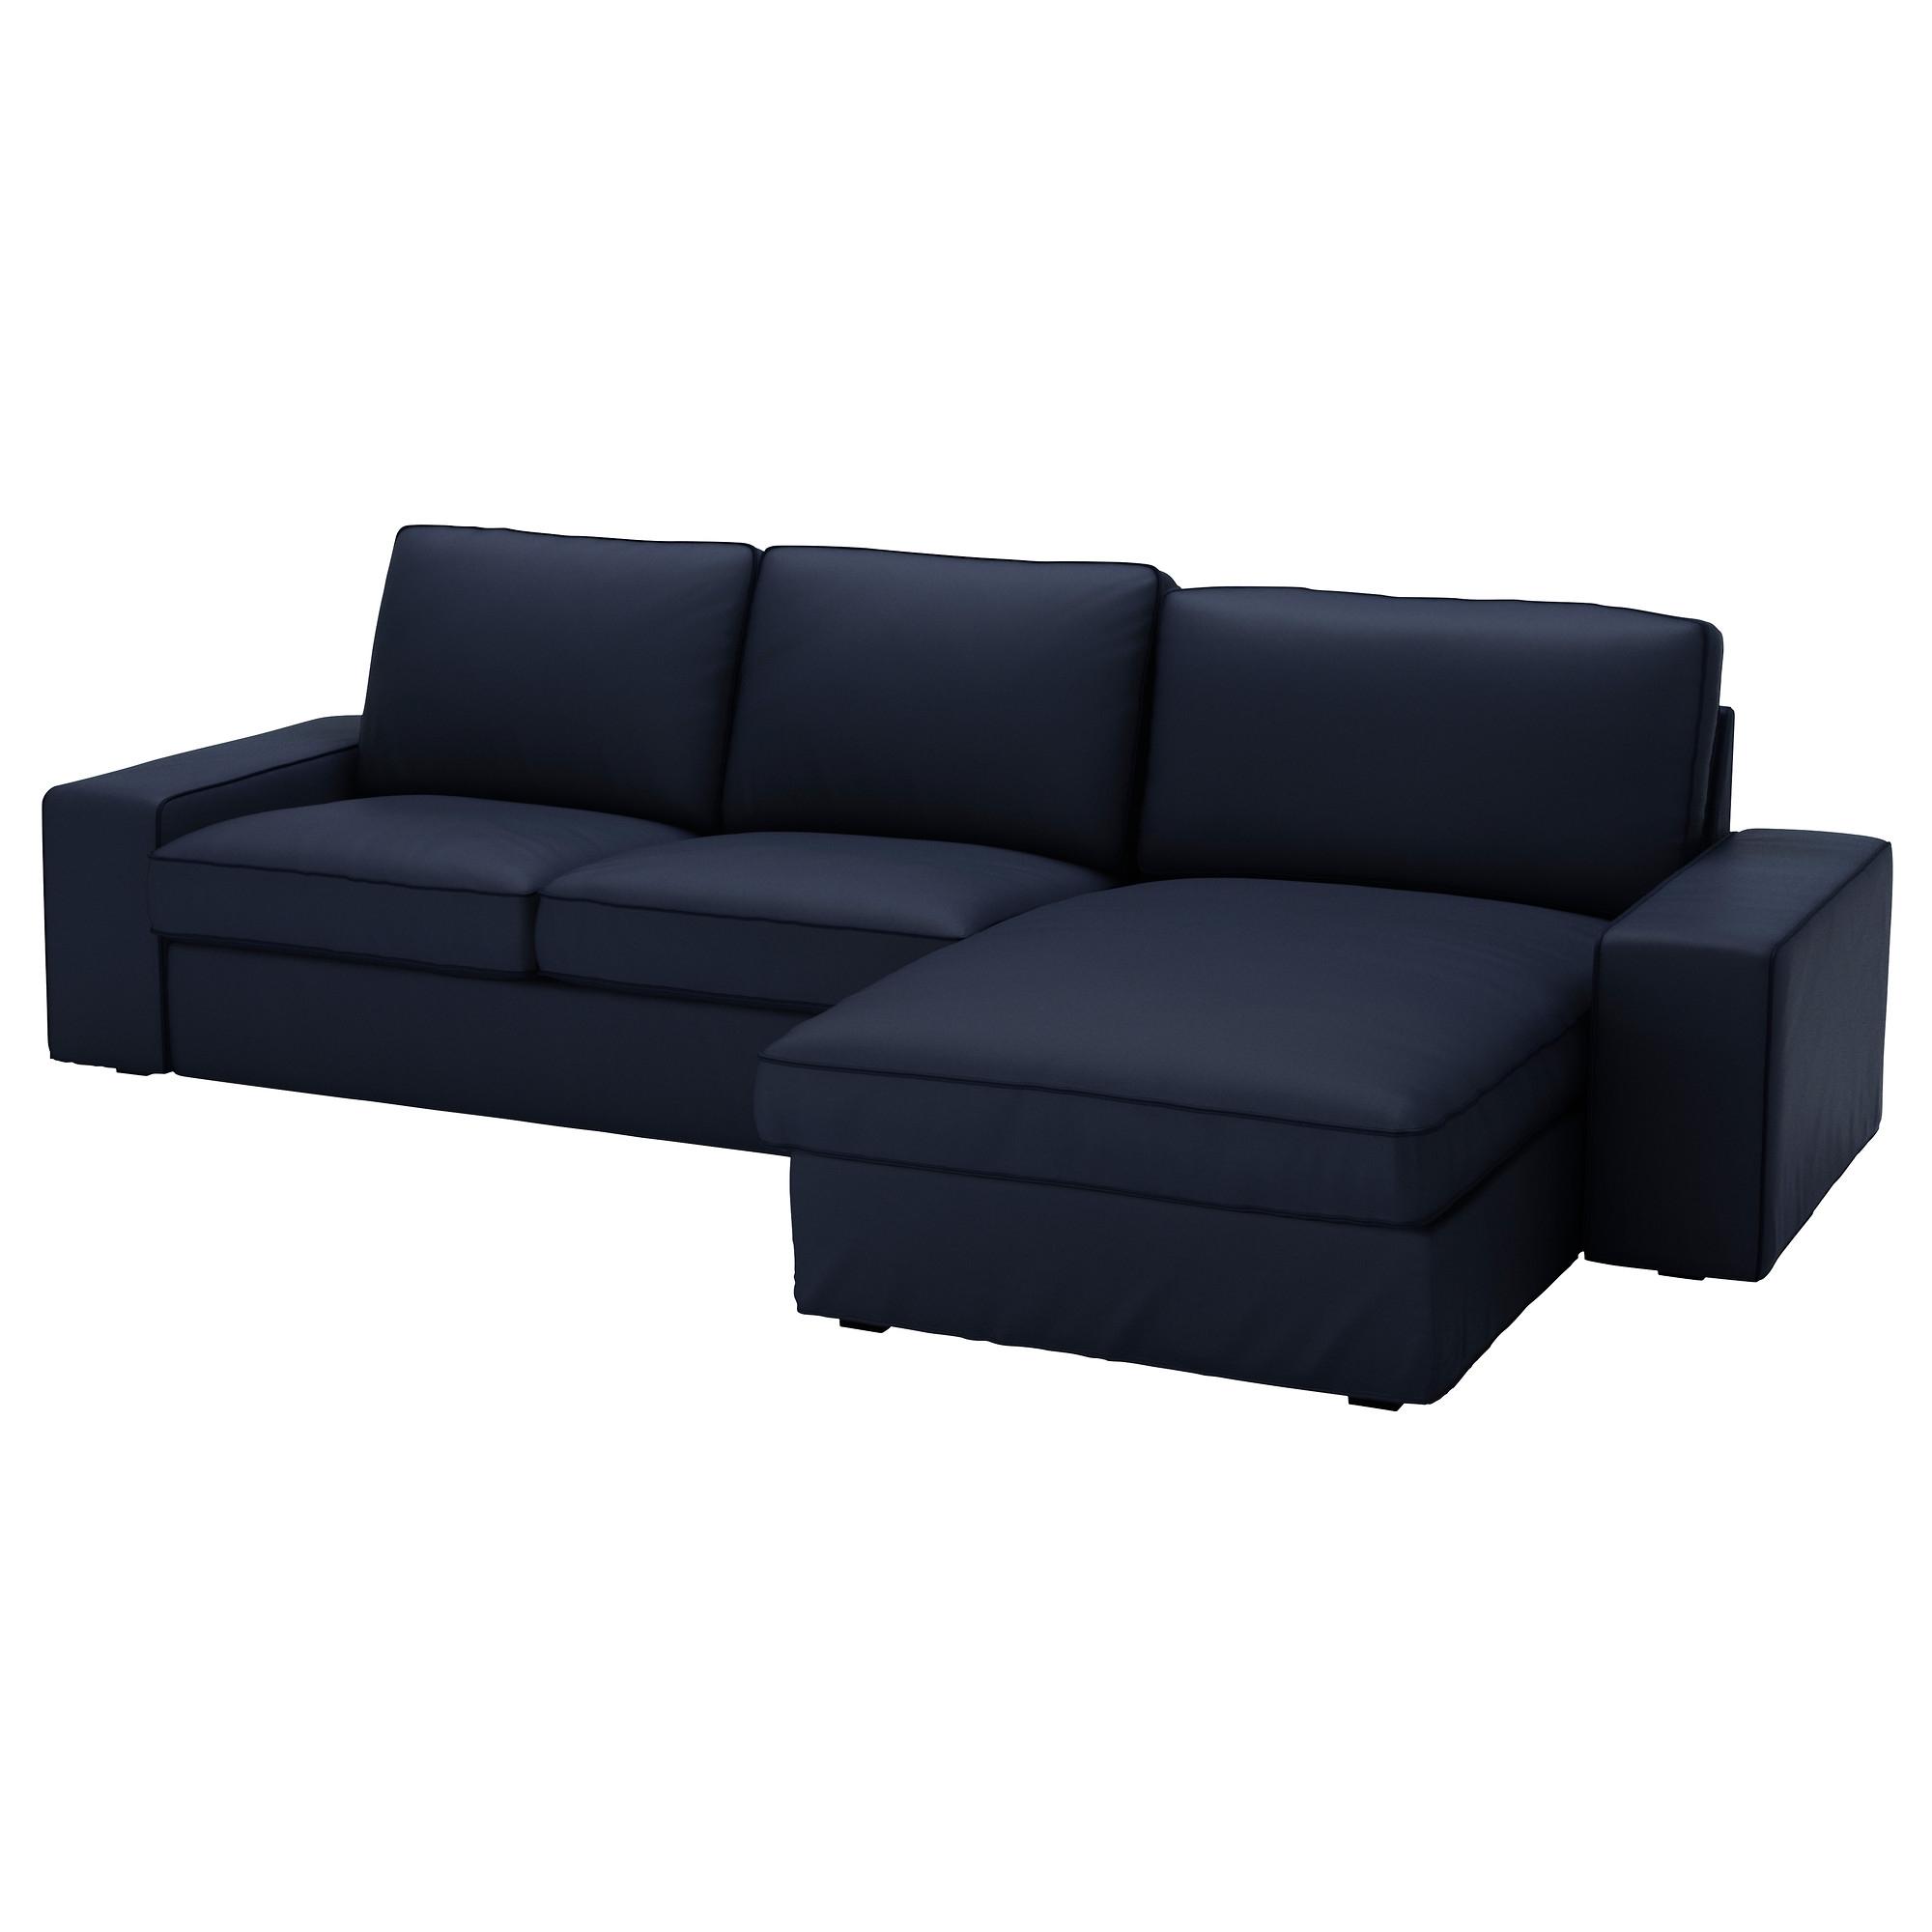 Kivik sof de 2 plazas y chaiselongue for Sofa kivik 2 plazas